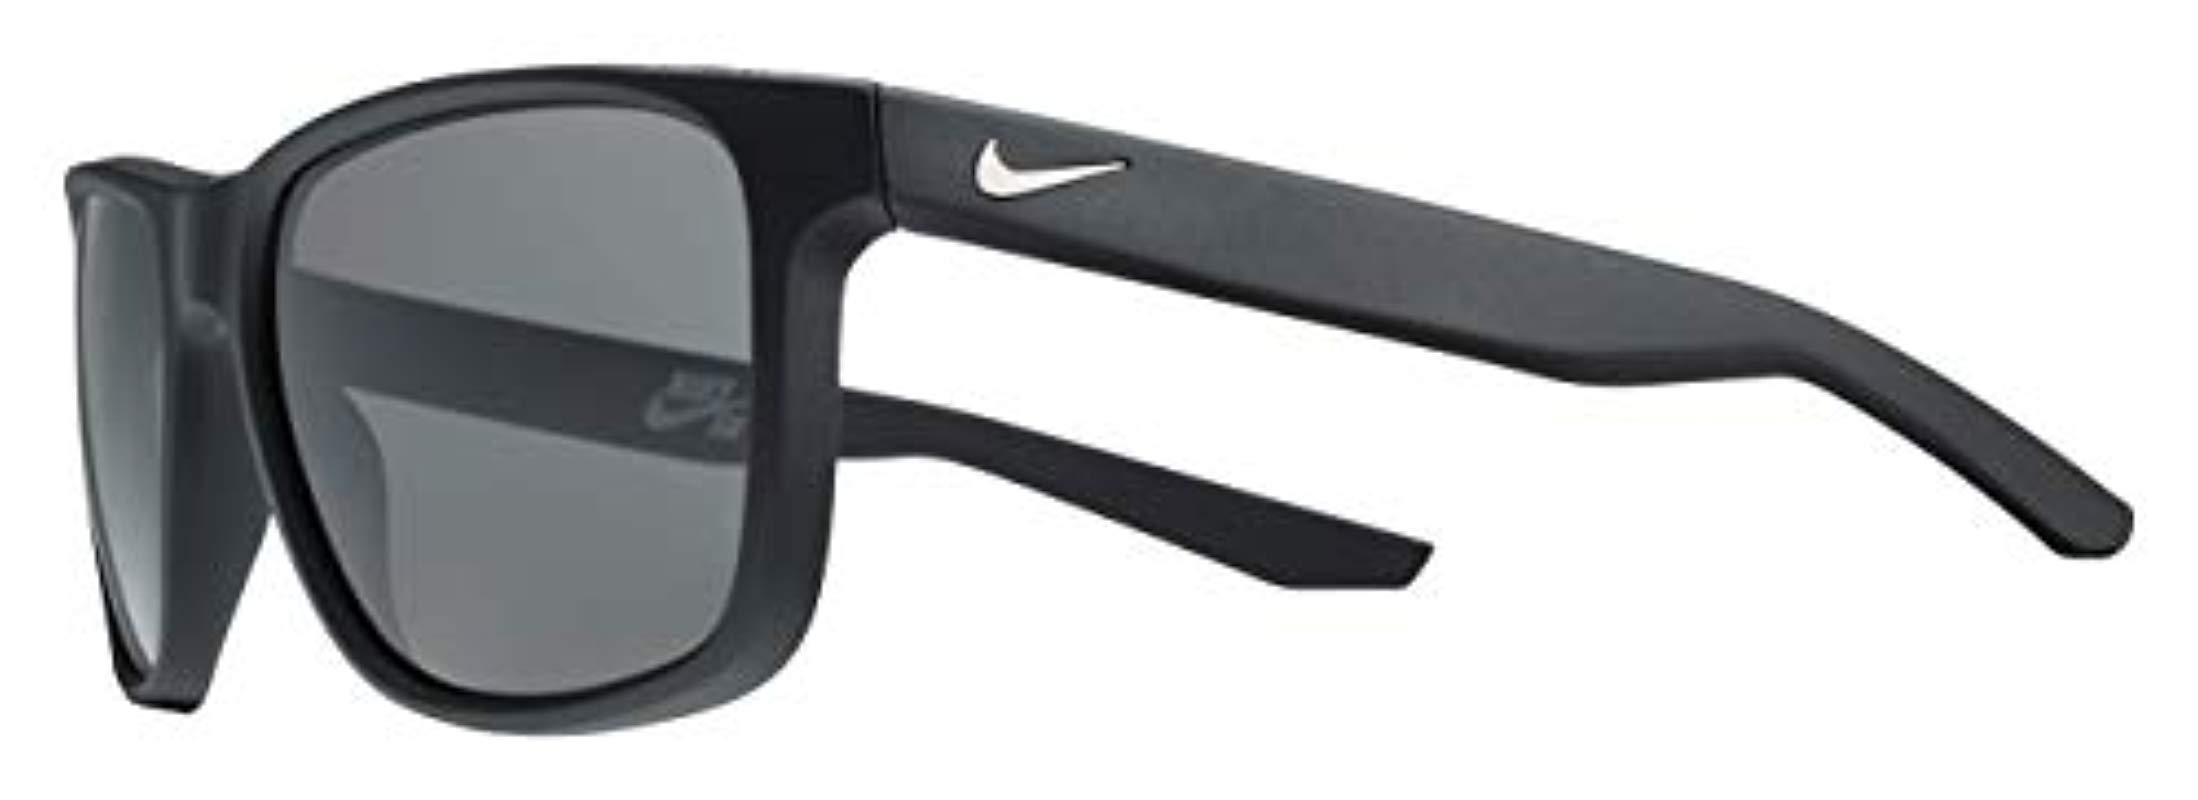 a7eea4d3d33bfe Nike Shade Vision Flip P Matte Black W in Black for Men - Lyst